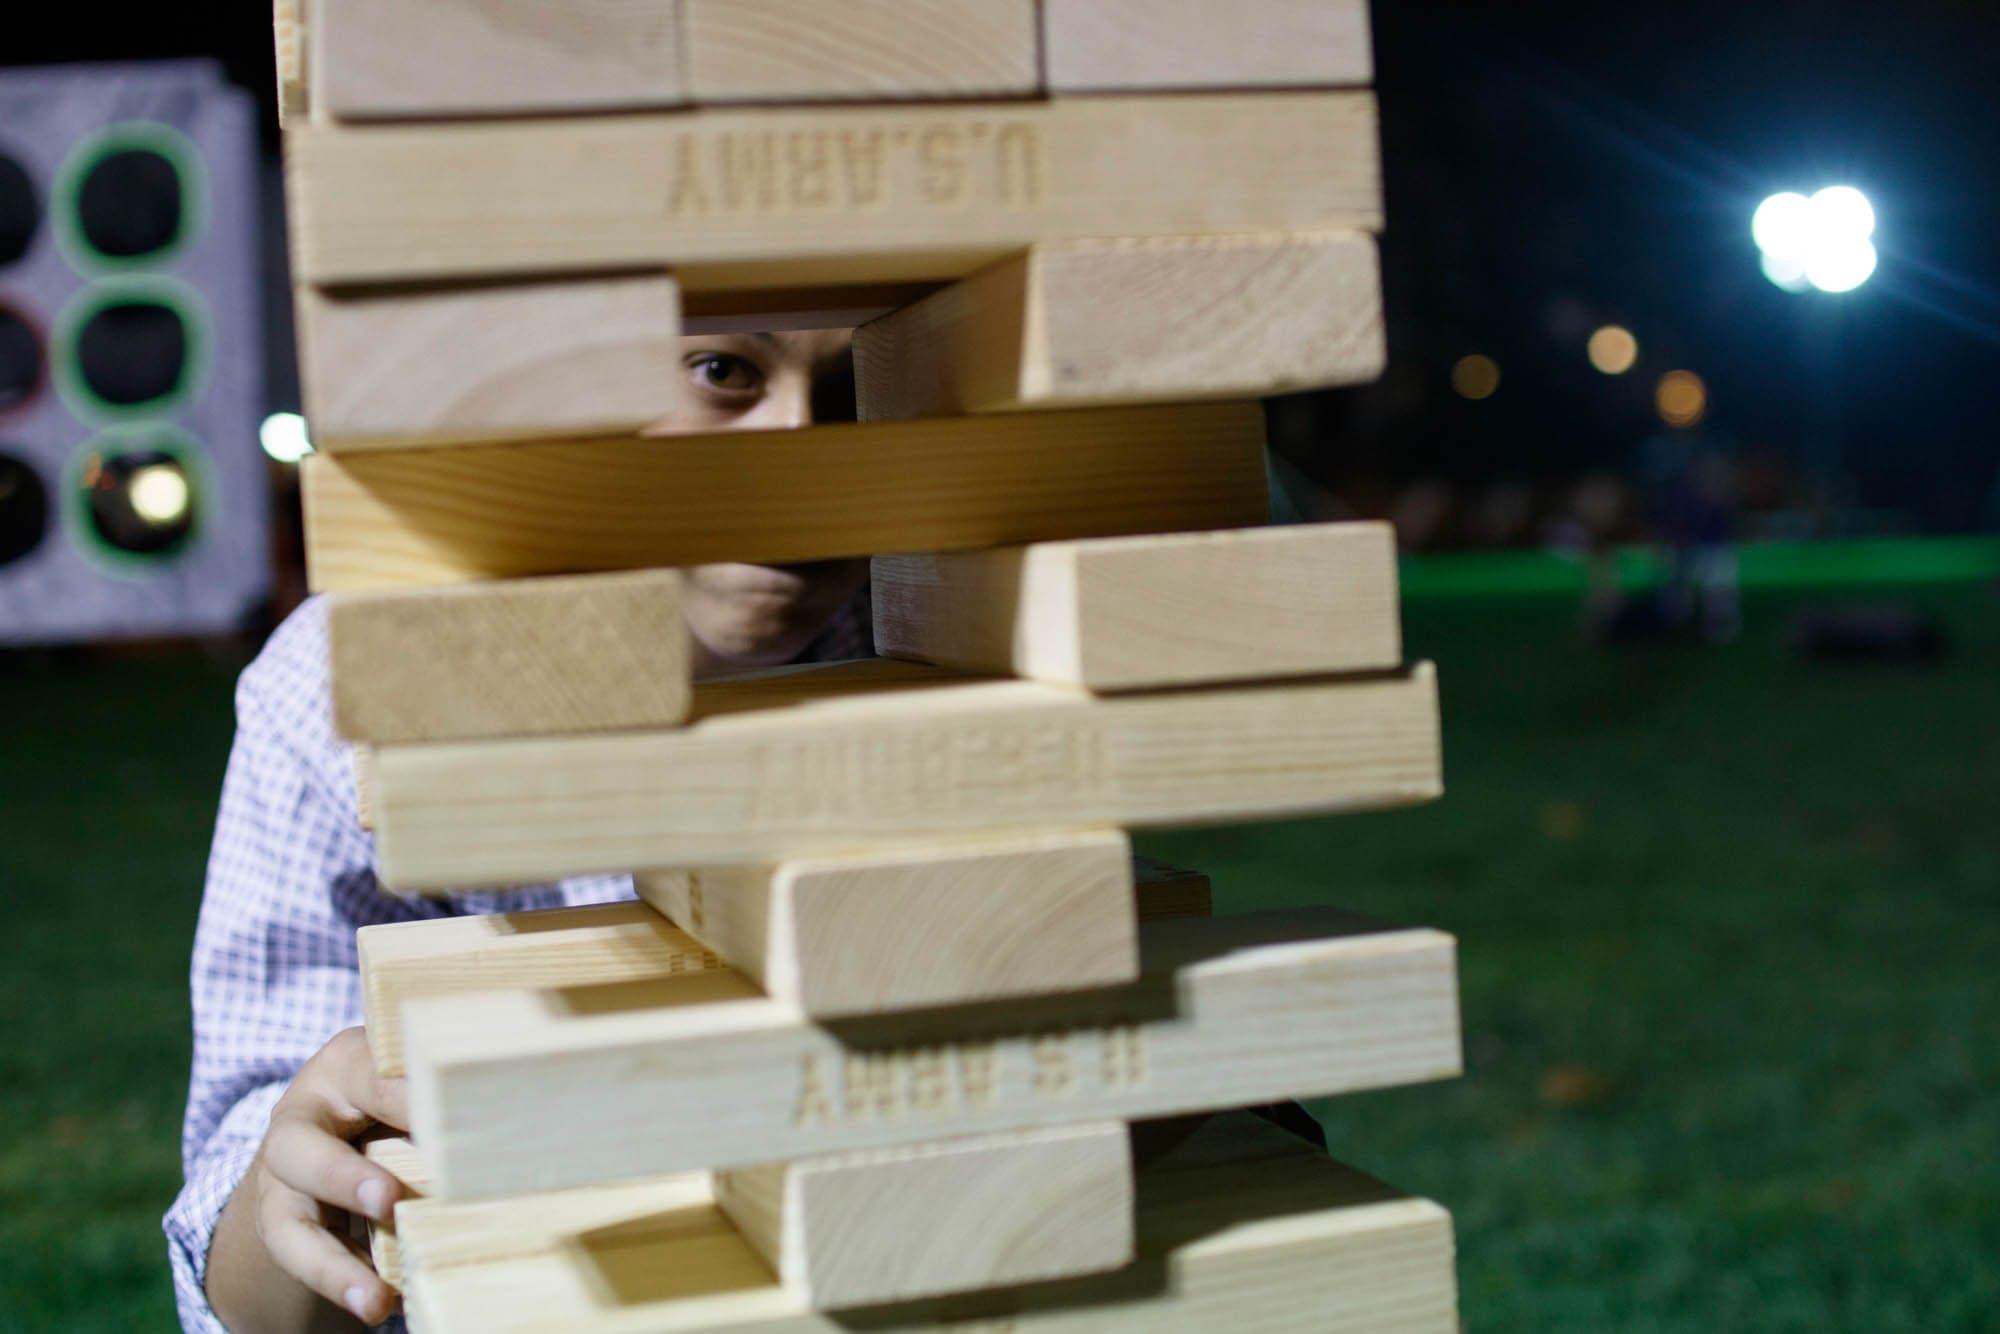 Giant game of Janga at Homecoming 2017